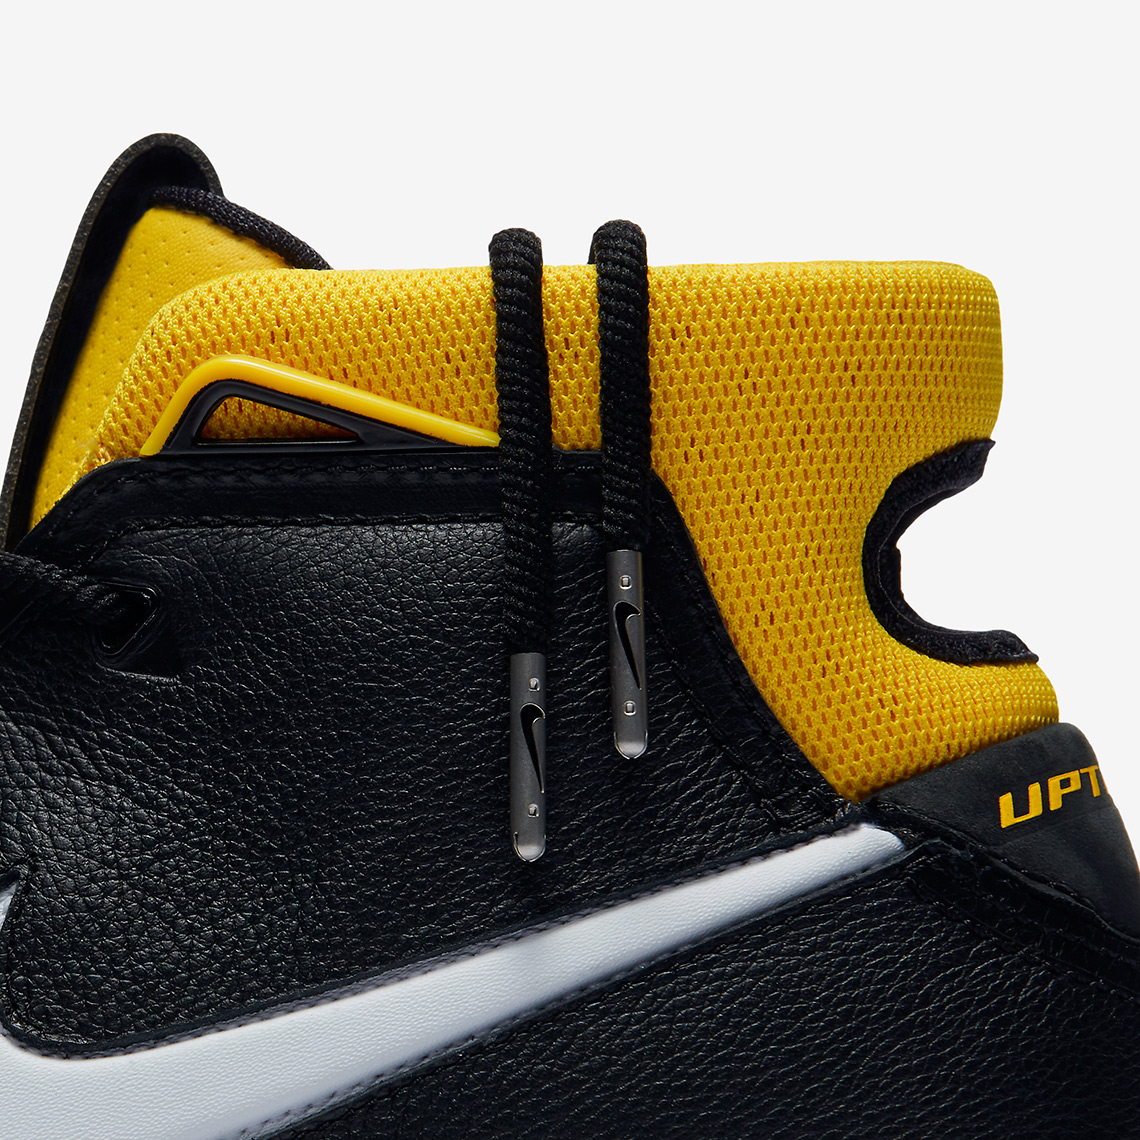 nike-zoom-kobe-1-protro-black-yellow-release-date-5.jpg